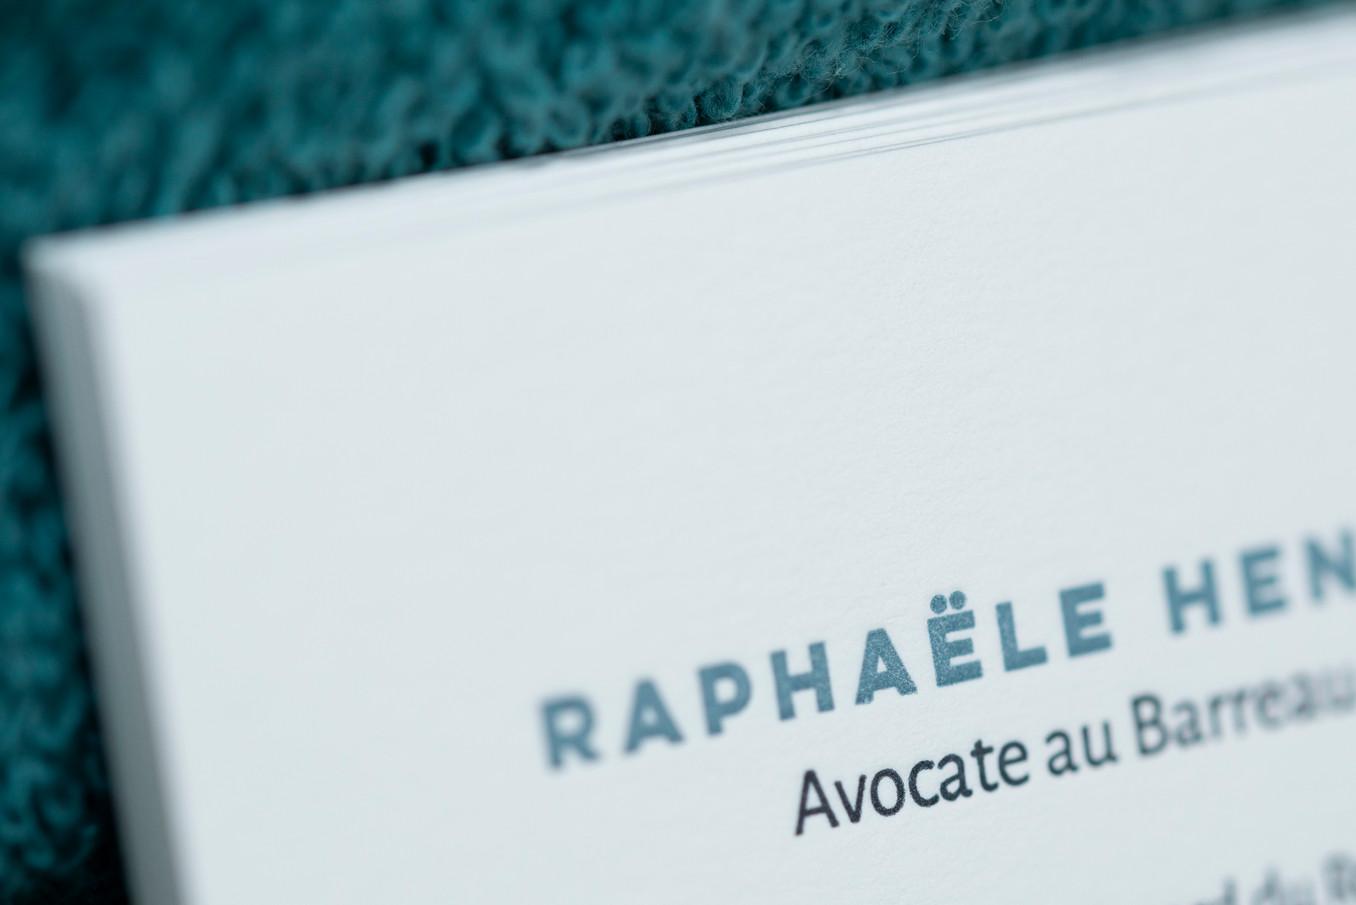 carte-de-visite-raphaele-hennemann-hotst